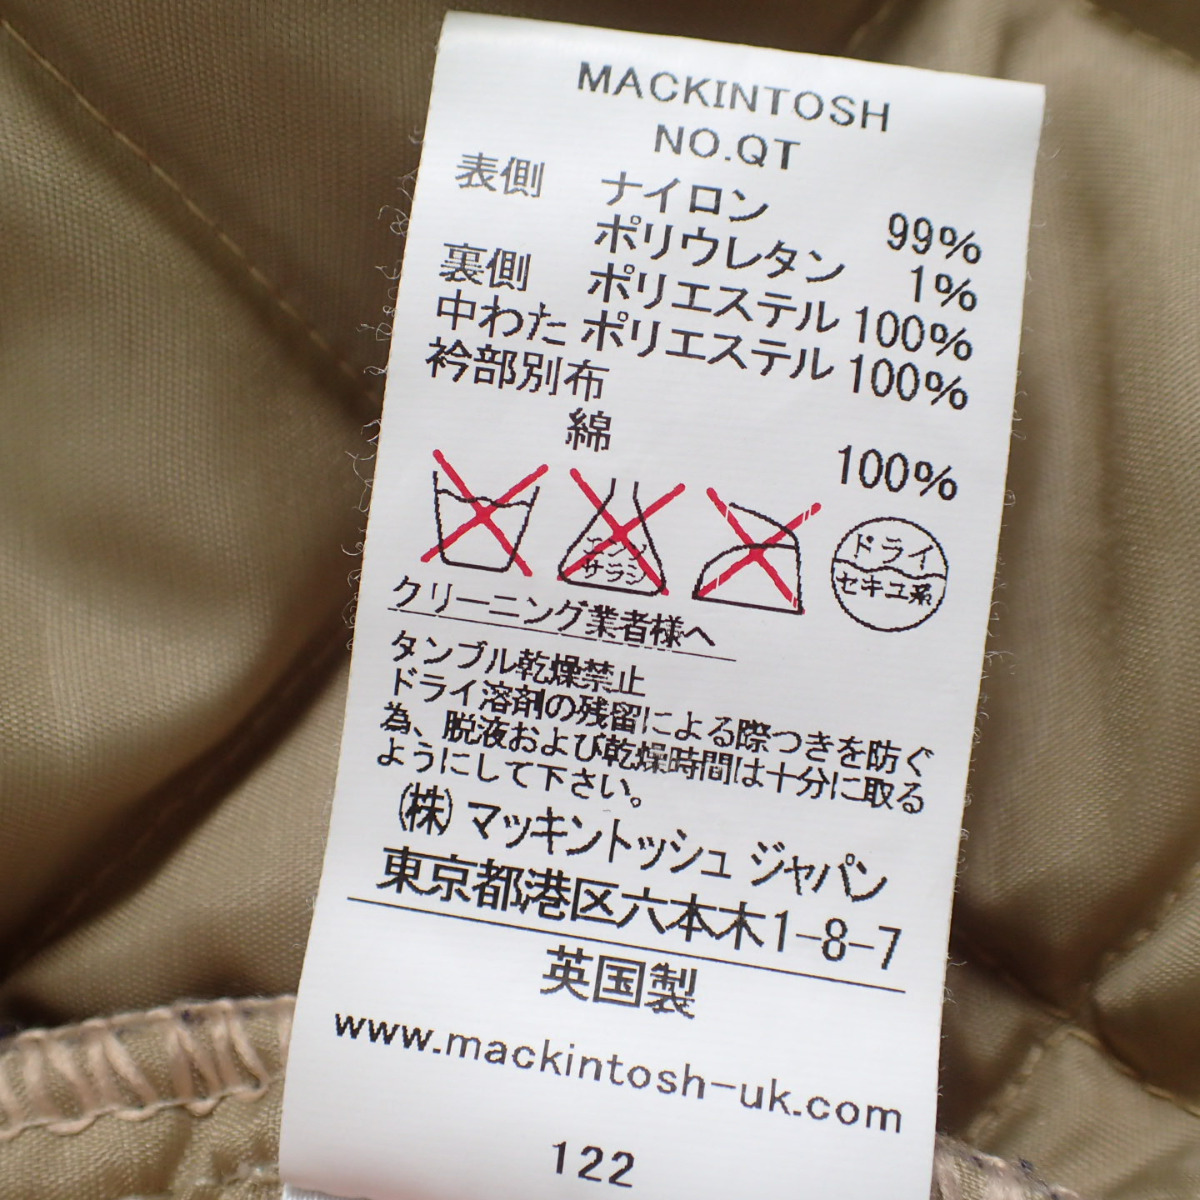 MACKINTOSHマッキントッシュ国内正規NO QT ナイロンキルティングジャケット 36 ダークベージュ メンズqSVMpUz